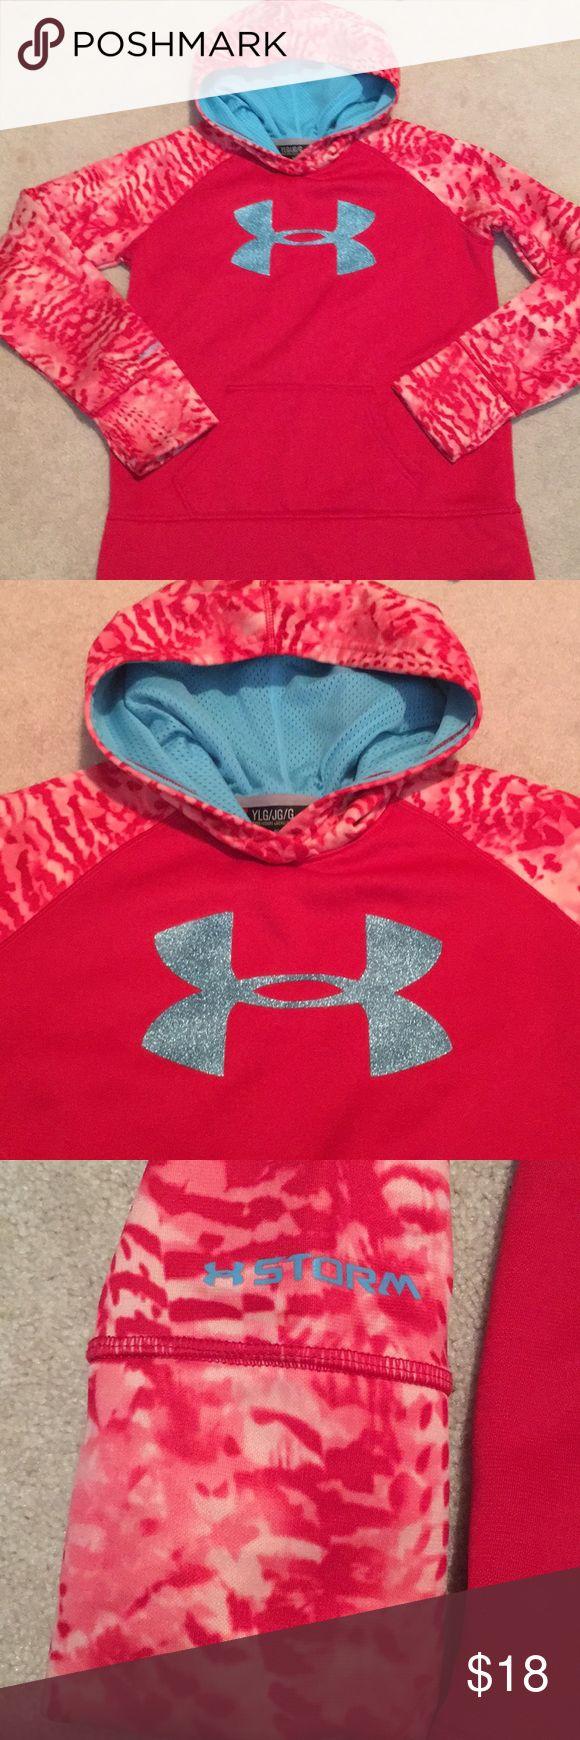 Best 25 Under Armour Sweatshirts Ideas On Pinterest -6381